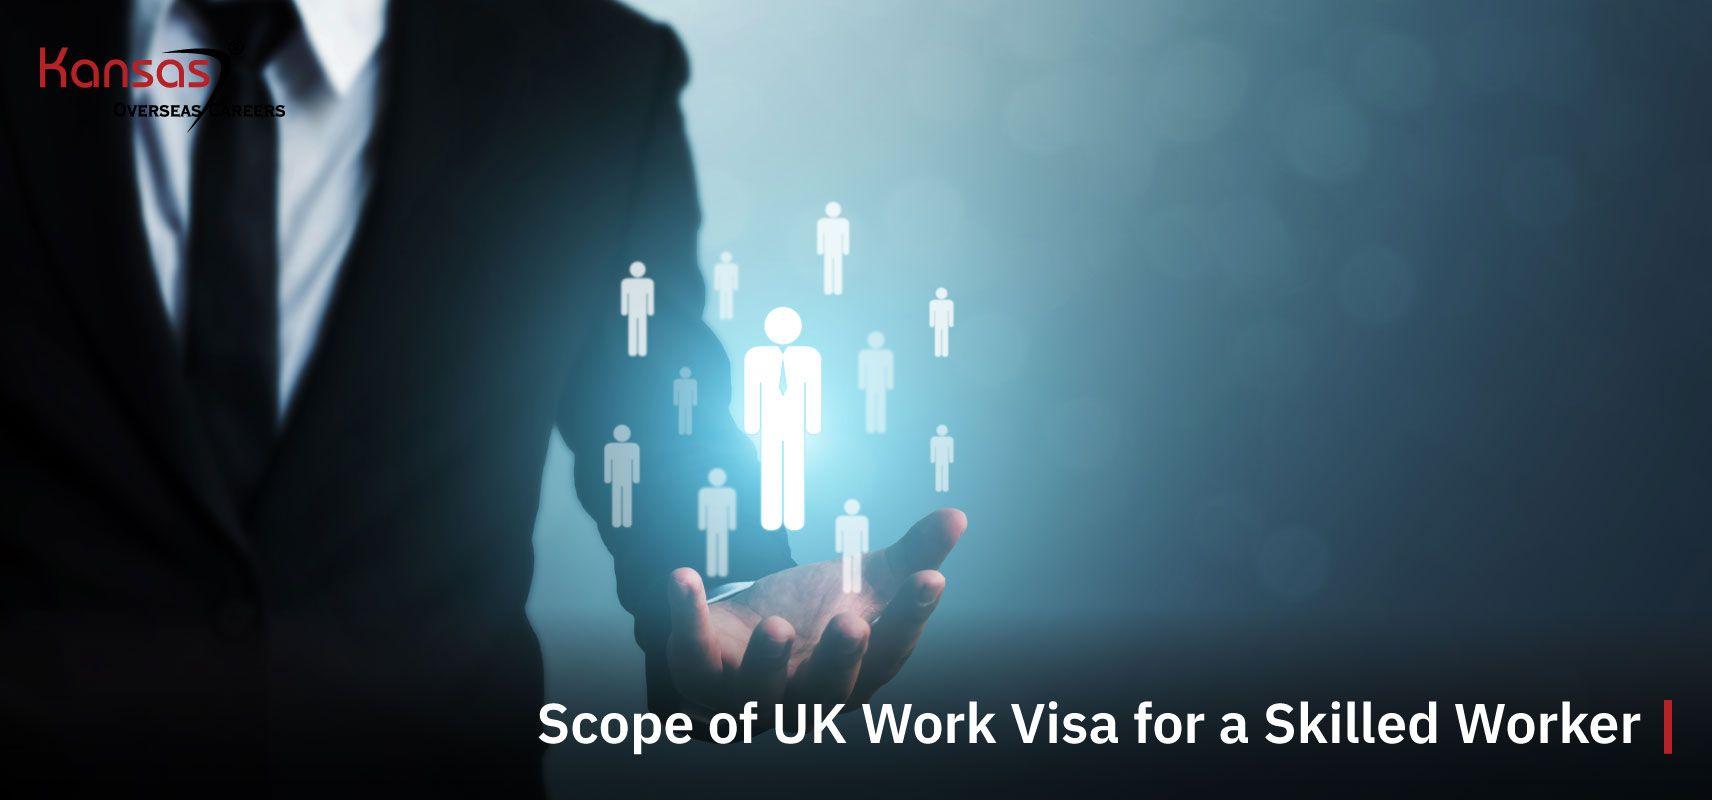 Scope-of-UK-Work-Visa-for-a-Skilled-Worker